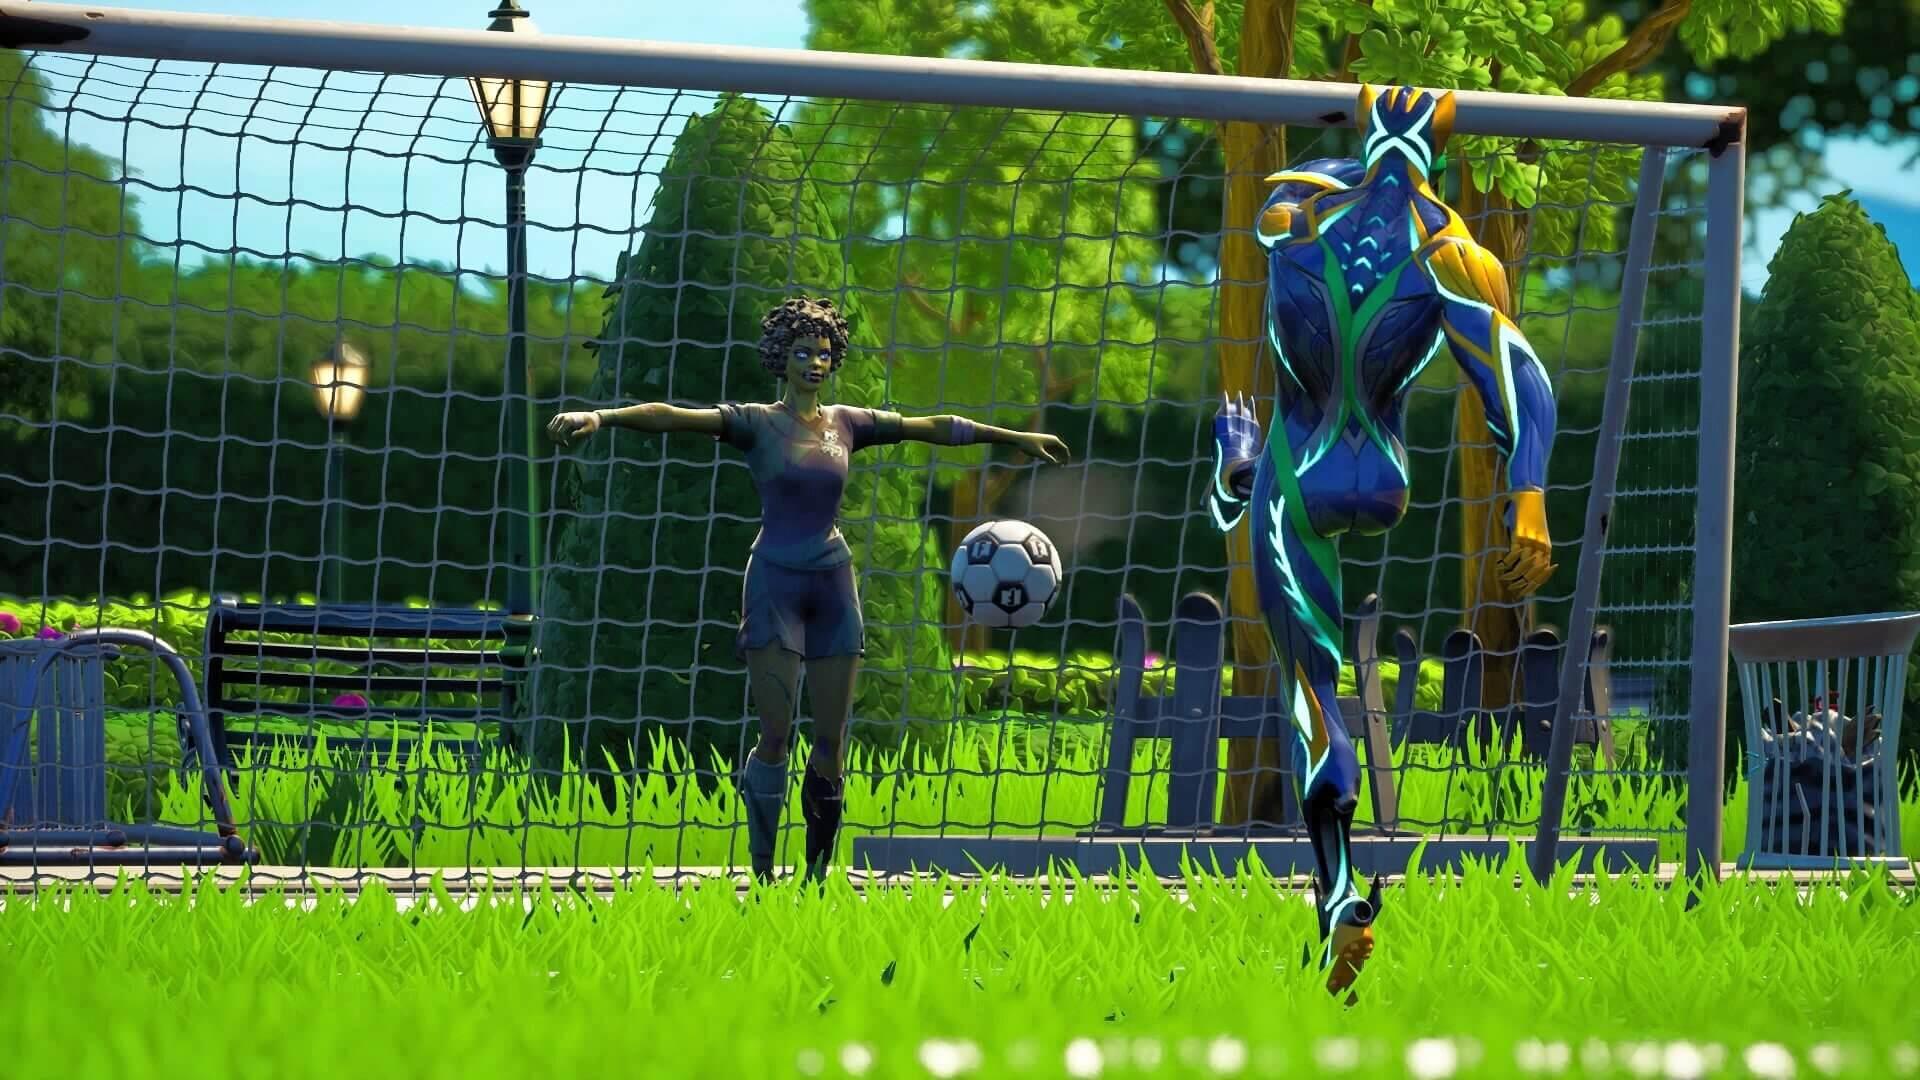 espacial35 Soccer Fortography